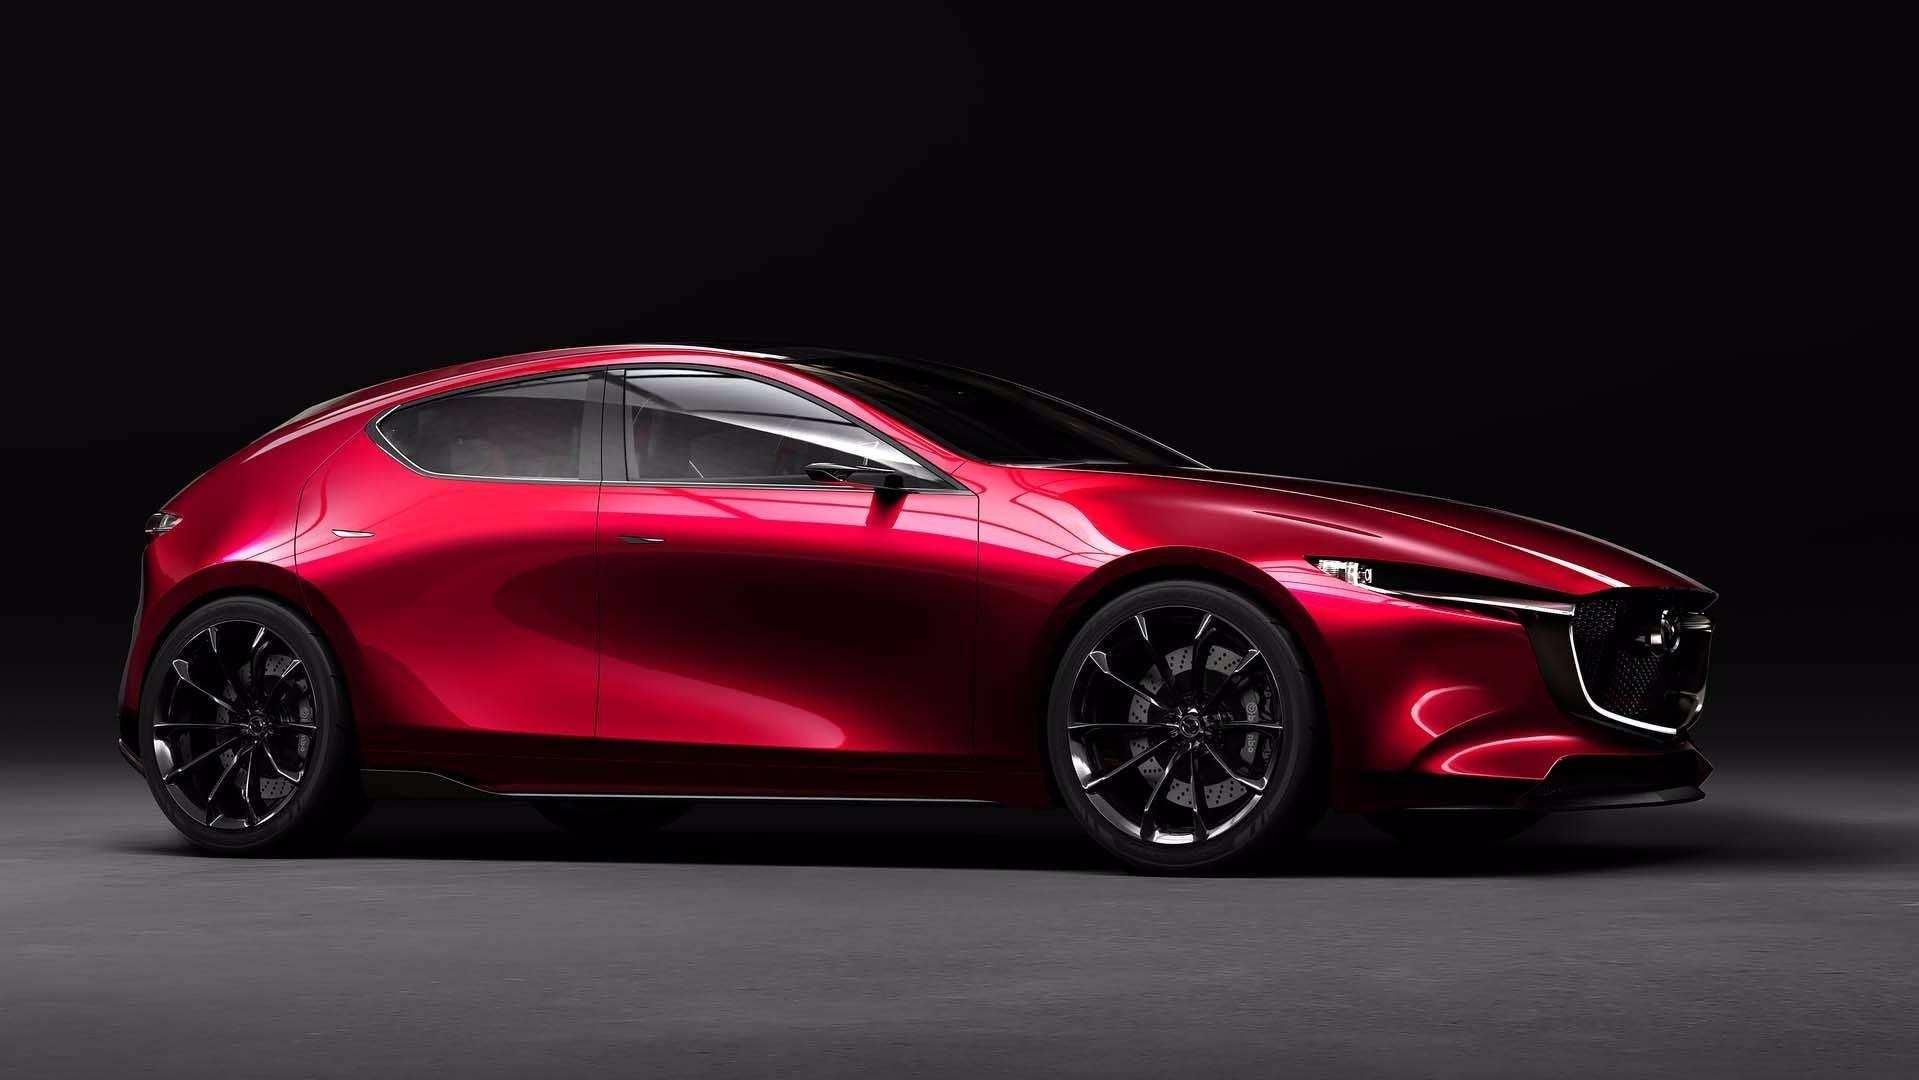 70 All New Mazda 2019 Lanzamiento Exterior And Interior Review Speed Test by Mazda 2019 Lanzamiento Exterior And Interior Review